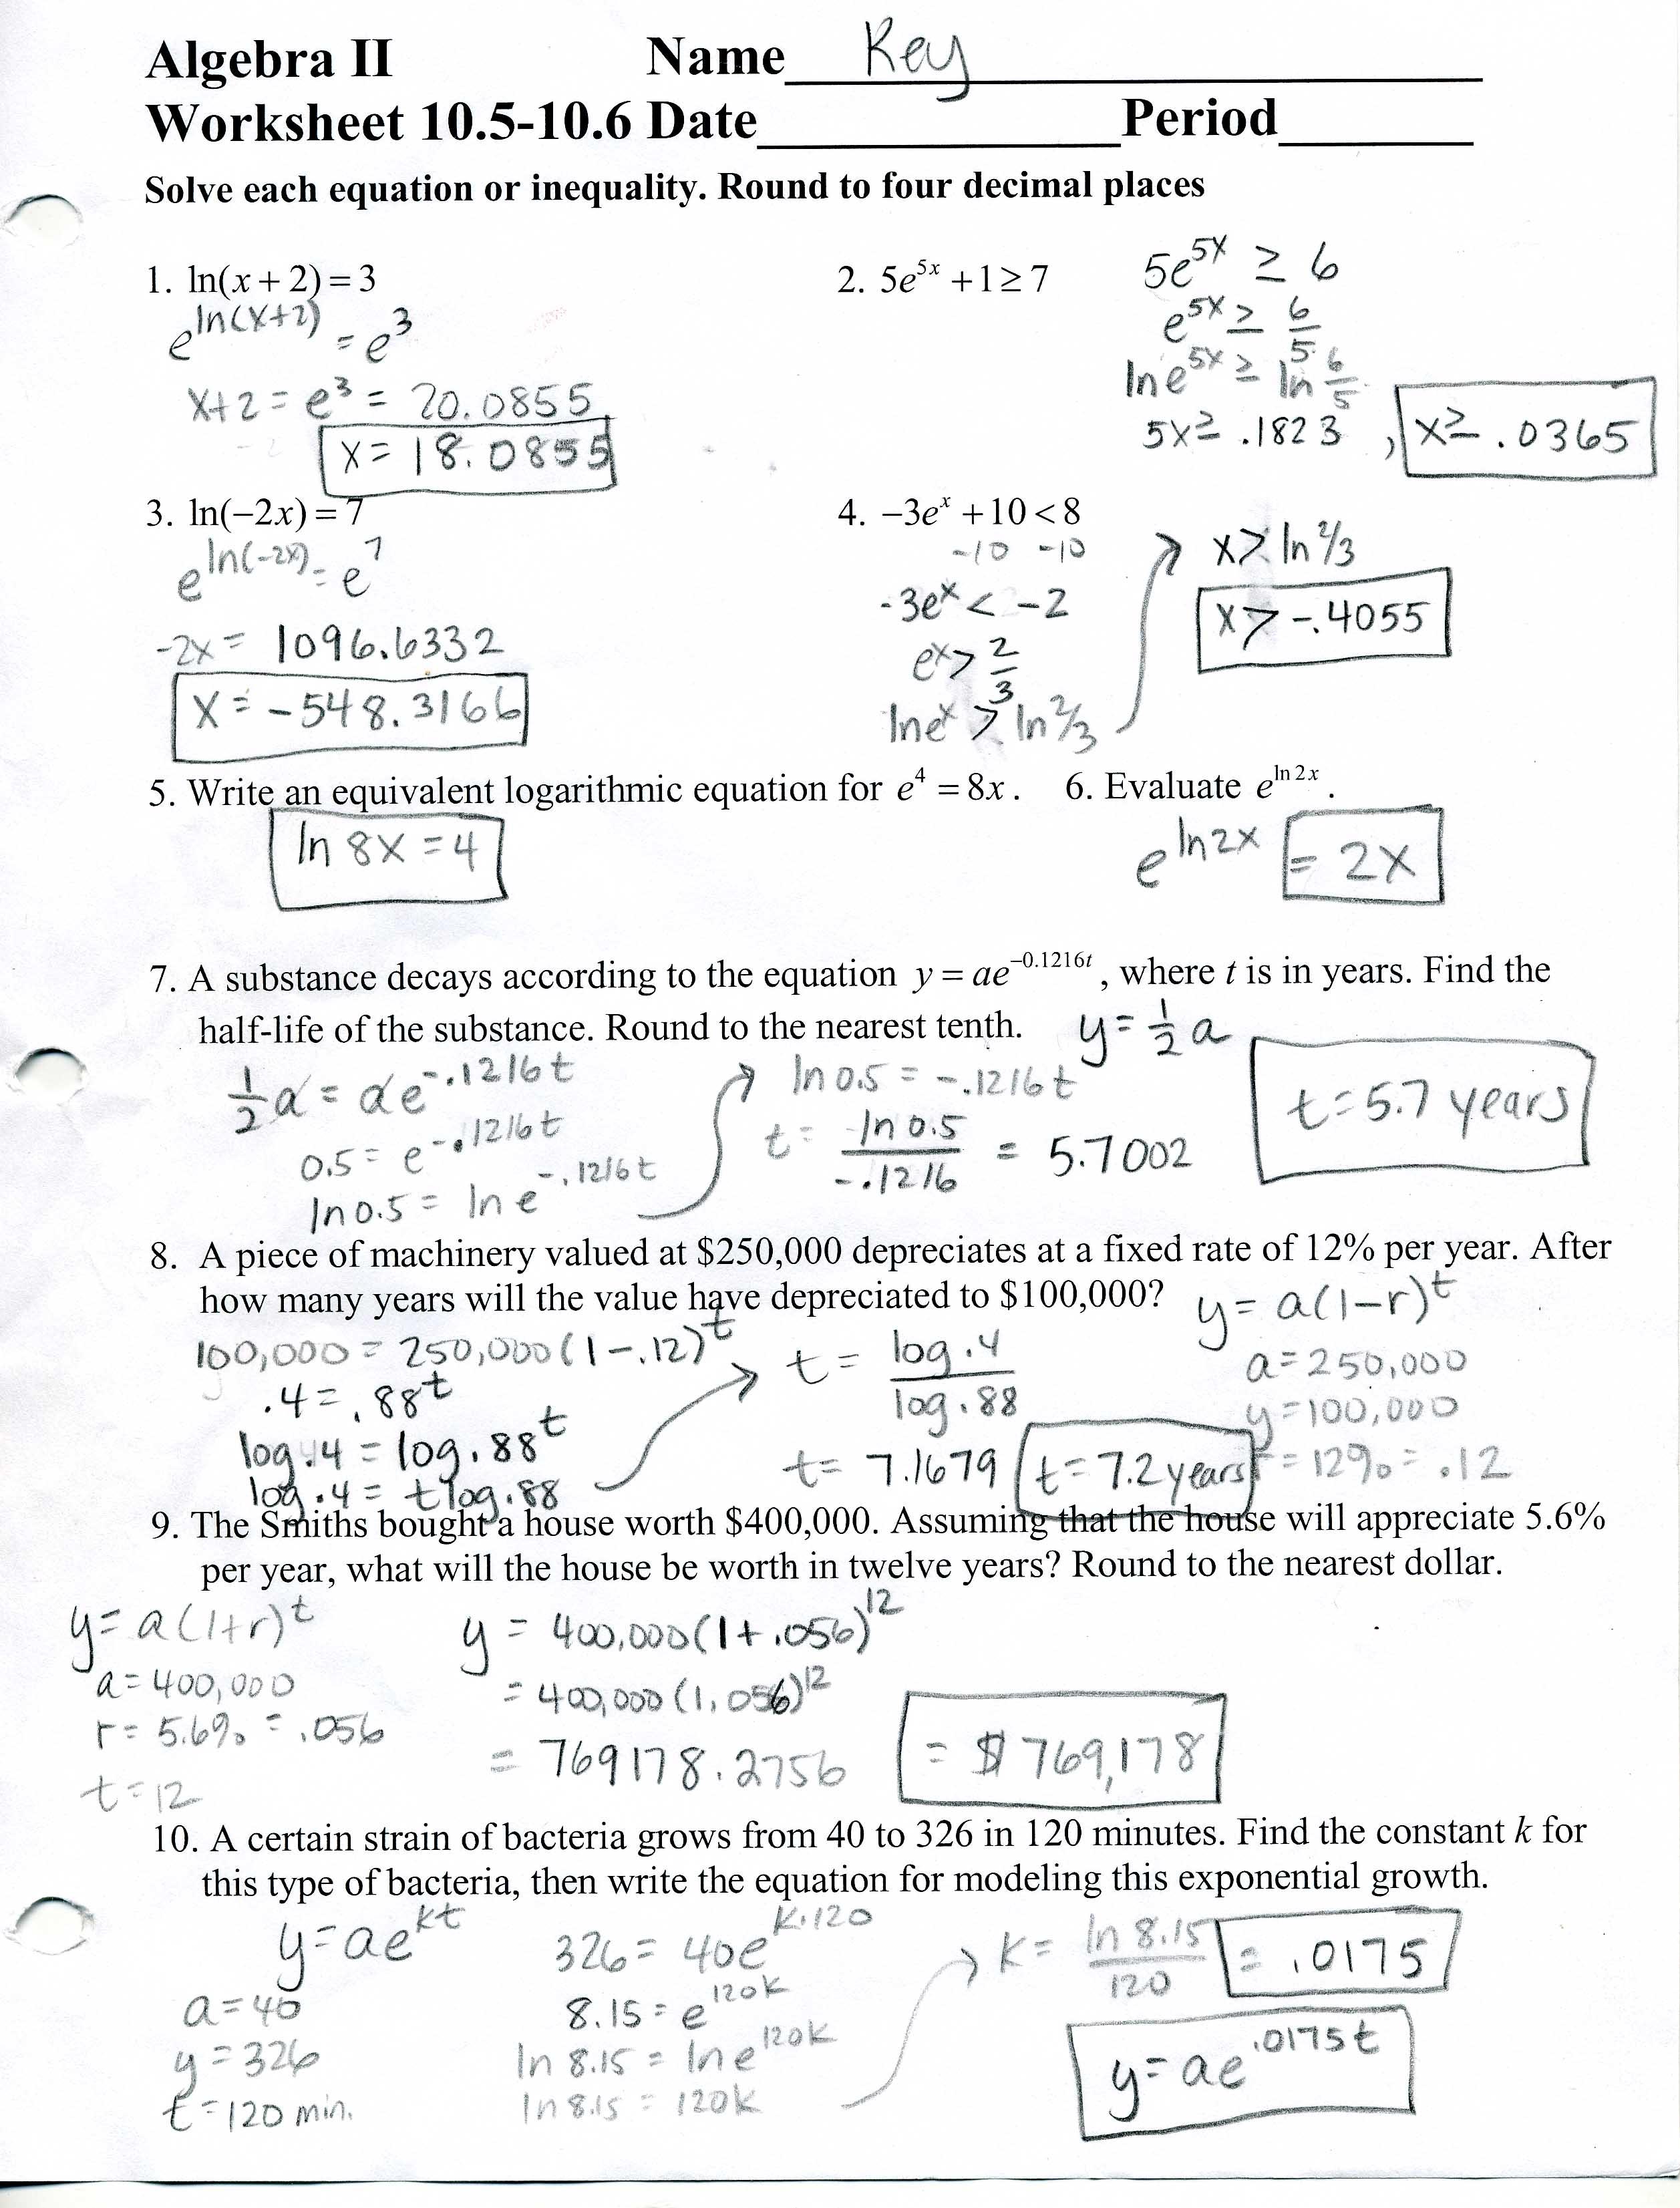 Free Algebra 2 Worksheets With Answer Key  Algebra